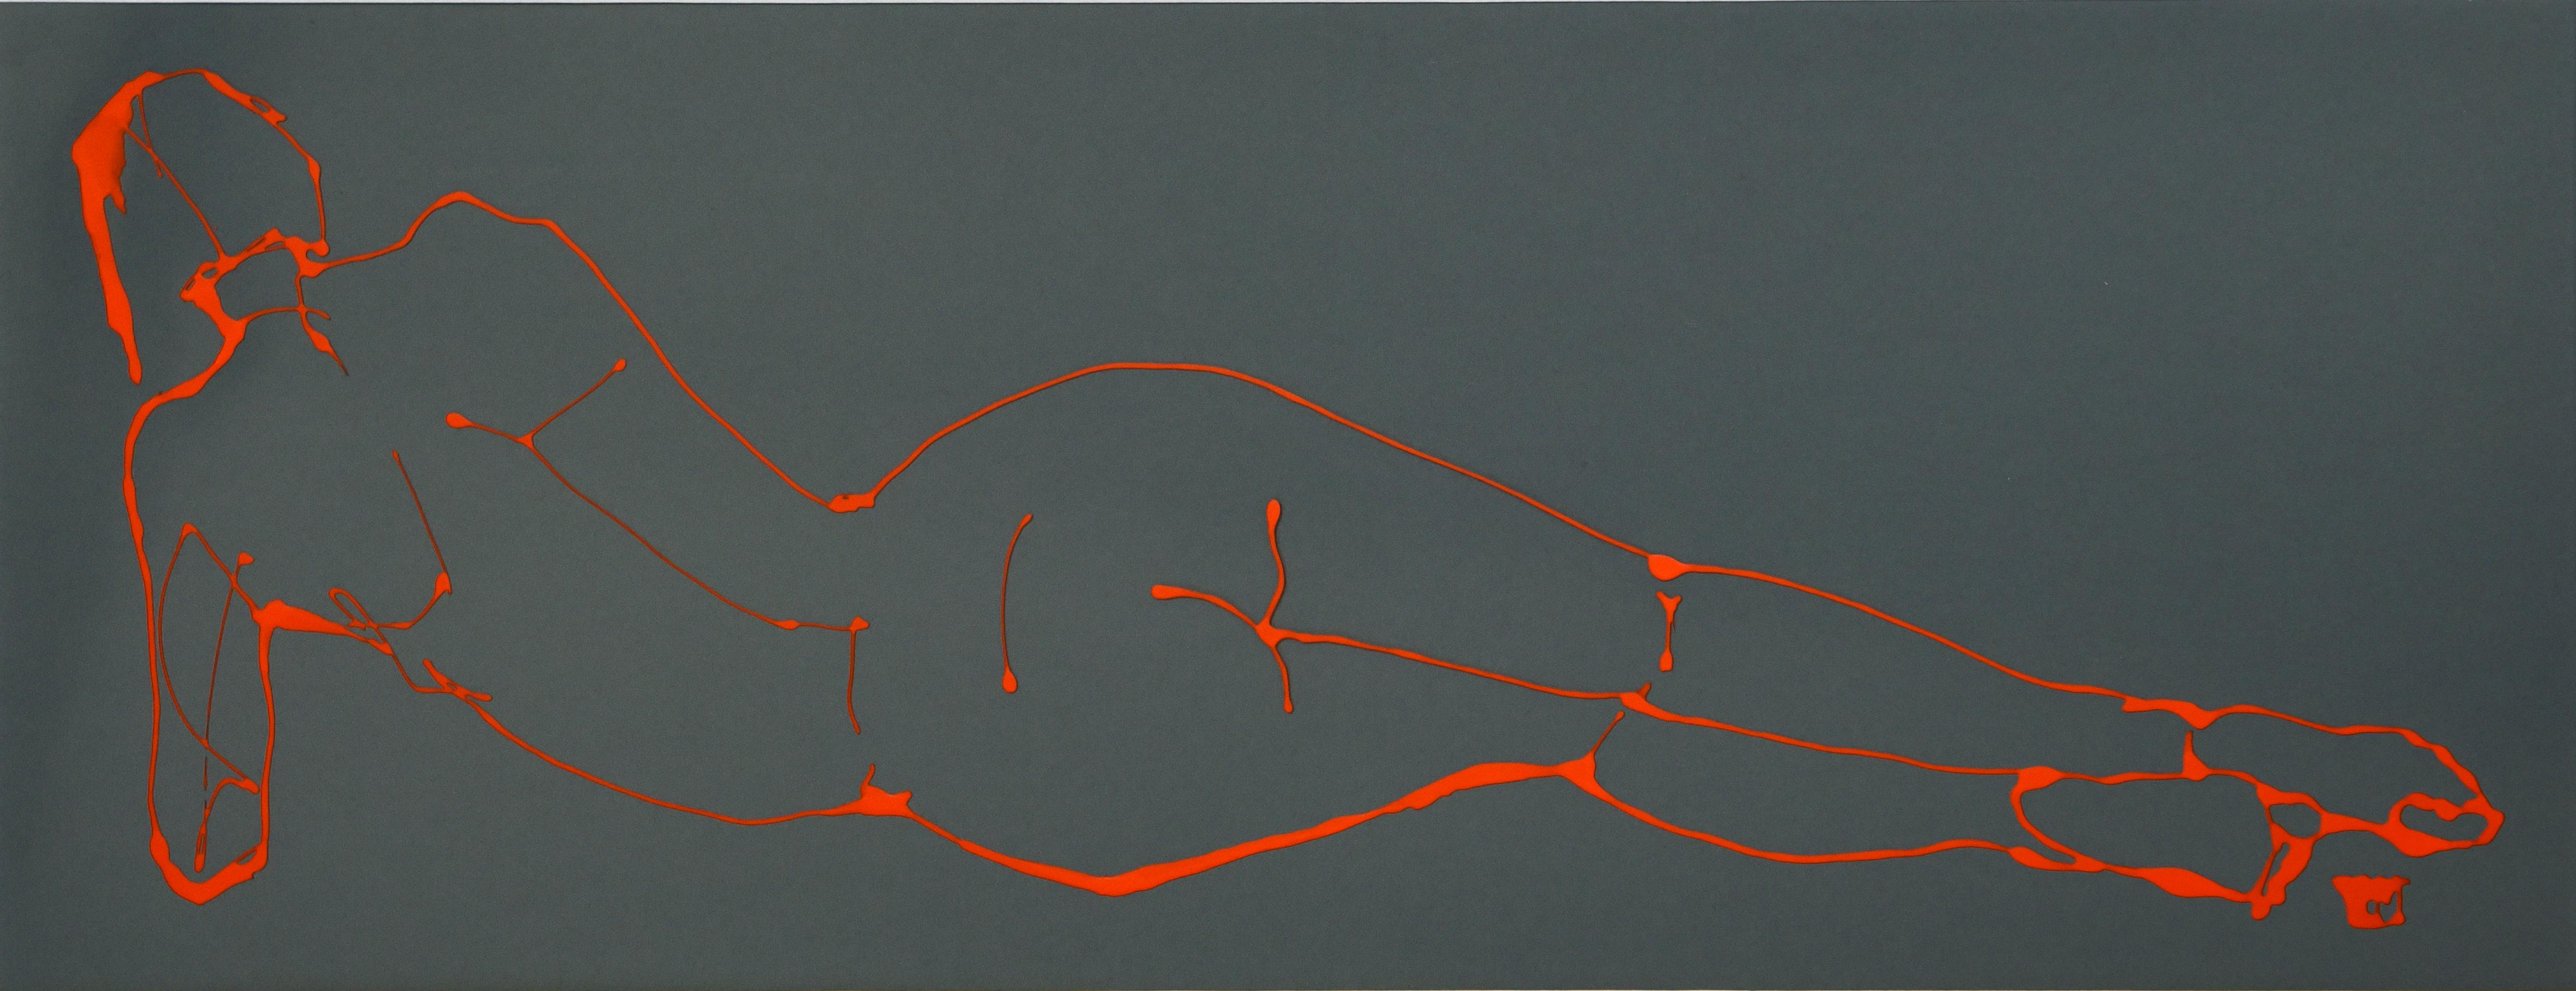 Waking (Liquid acrylic on Mylar, 72.5 x 41cms, framed)